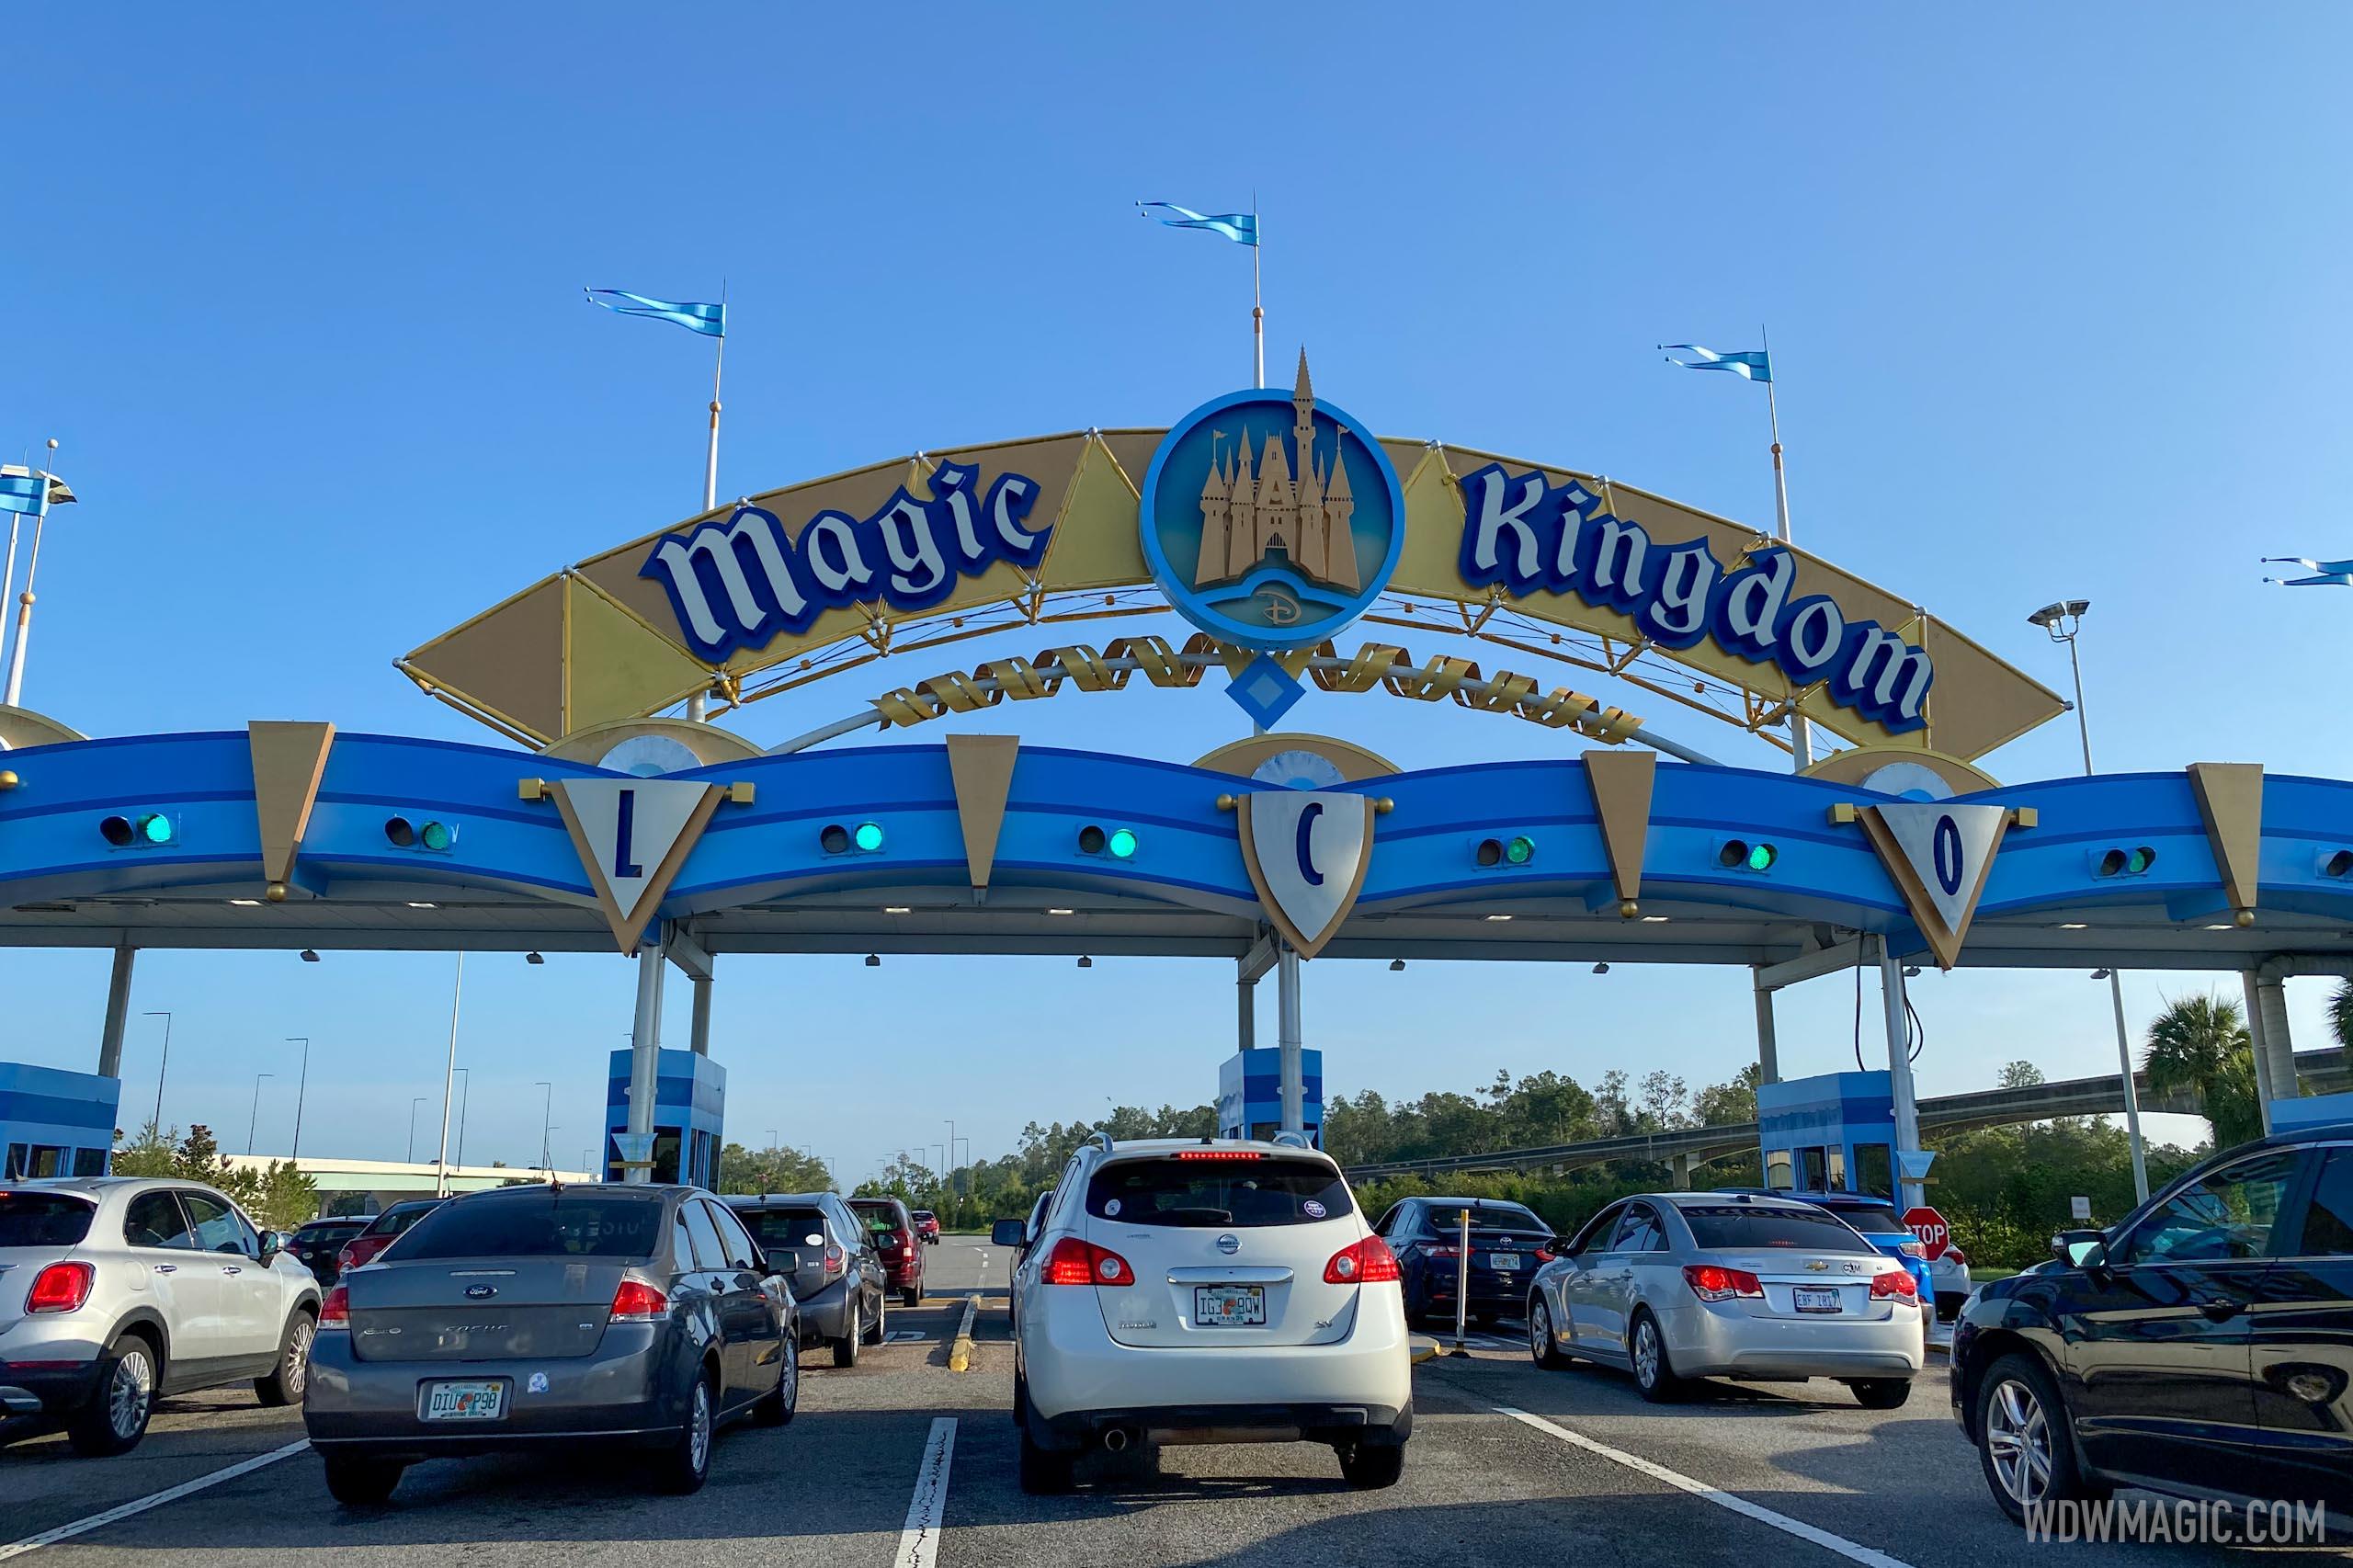 Magic Kingdom auto plaza opened 1 hour before park opening